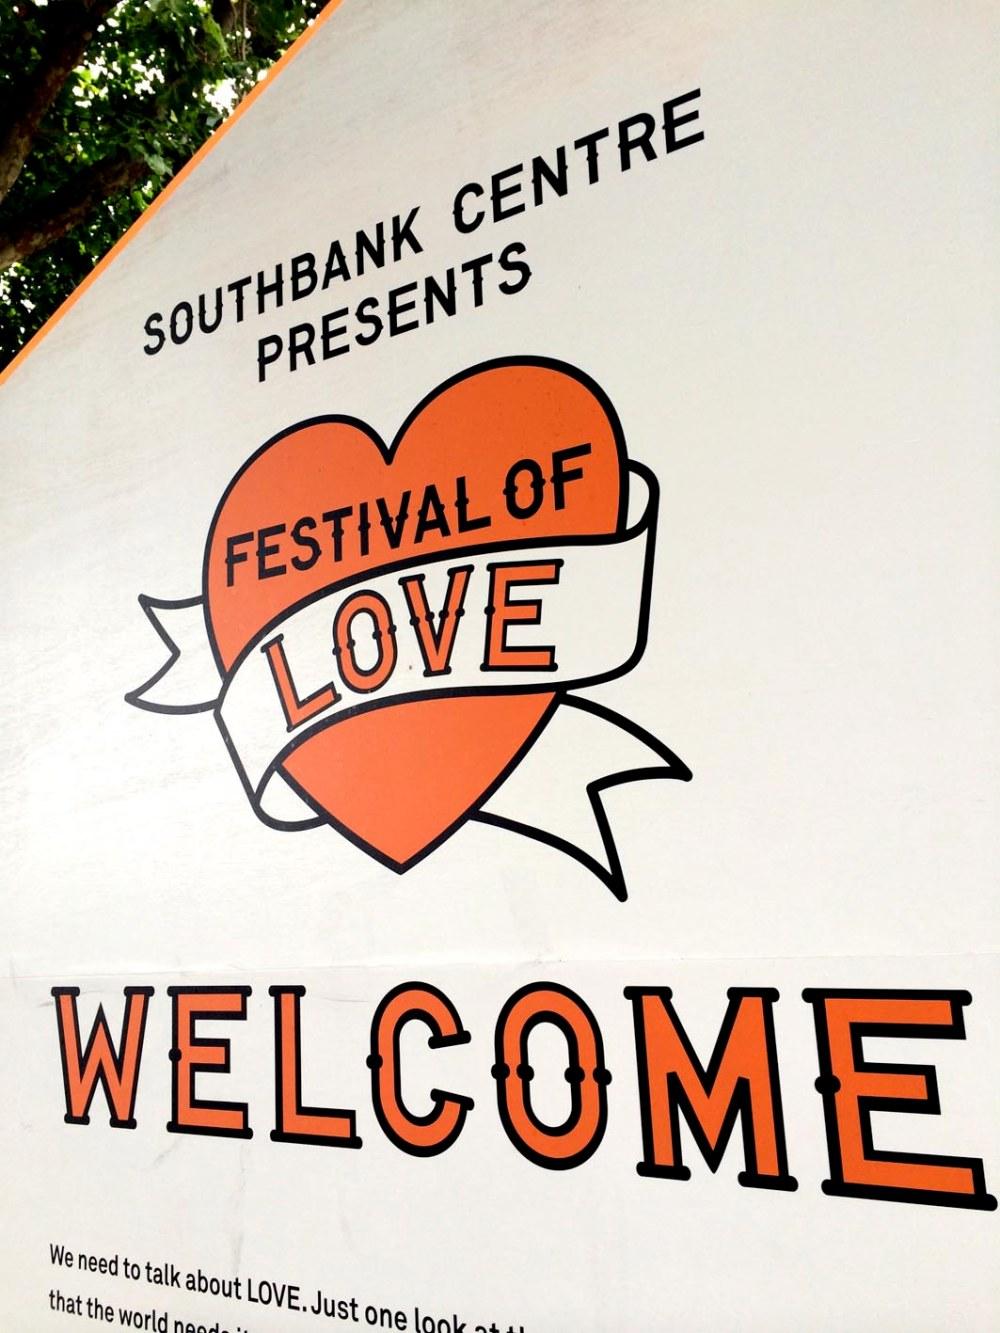 FESTIVAL_OF_LOVE_SOUTHBANK_7